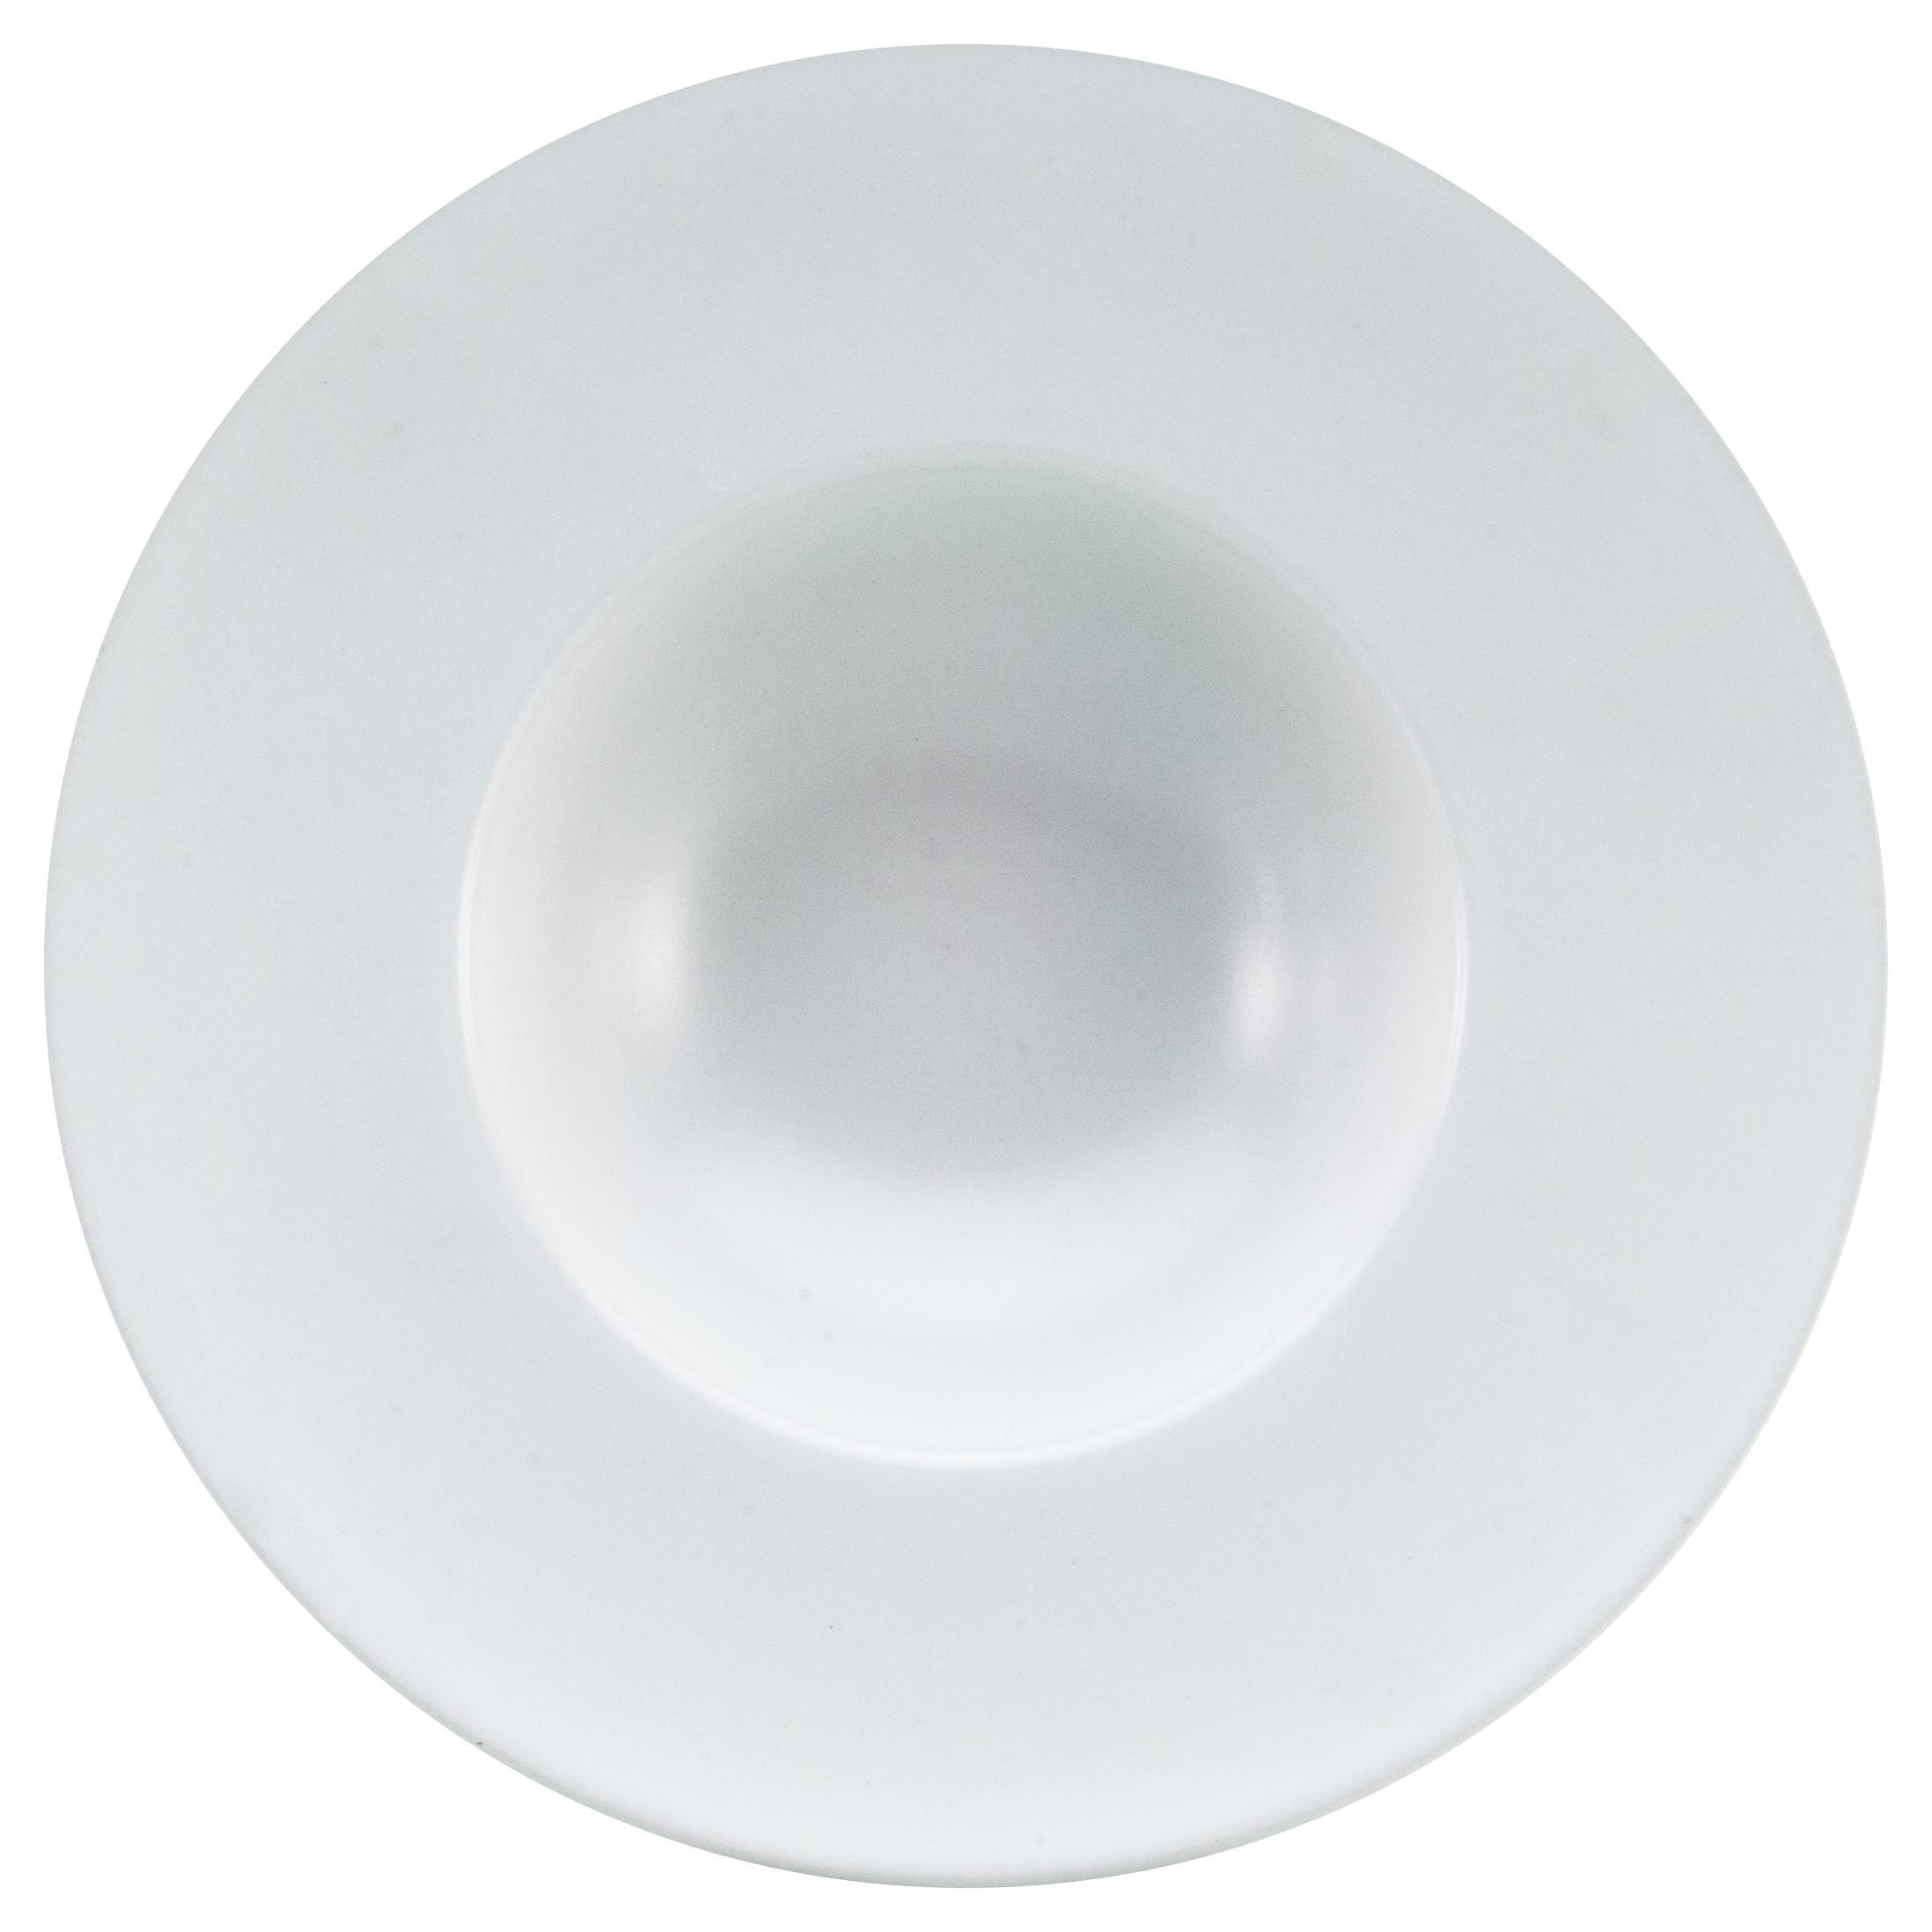 6 Stück Menüteller Teller flach Essteller Teller Eckig ca.29 cm weiß